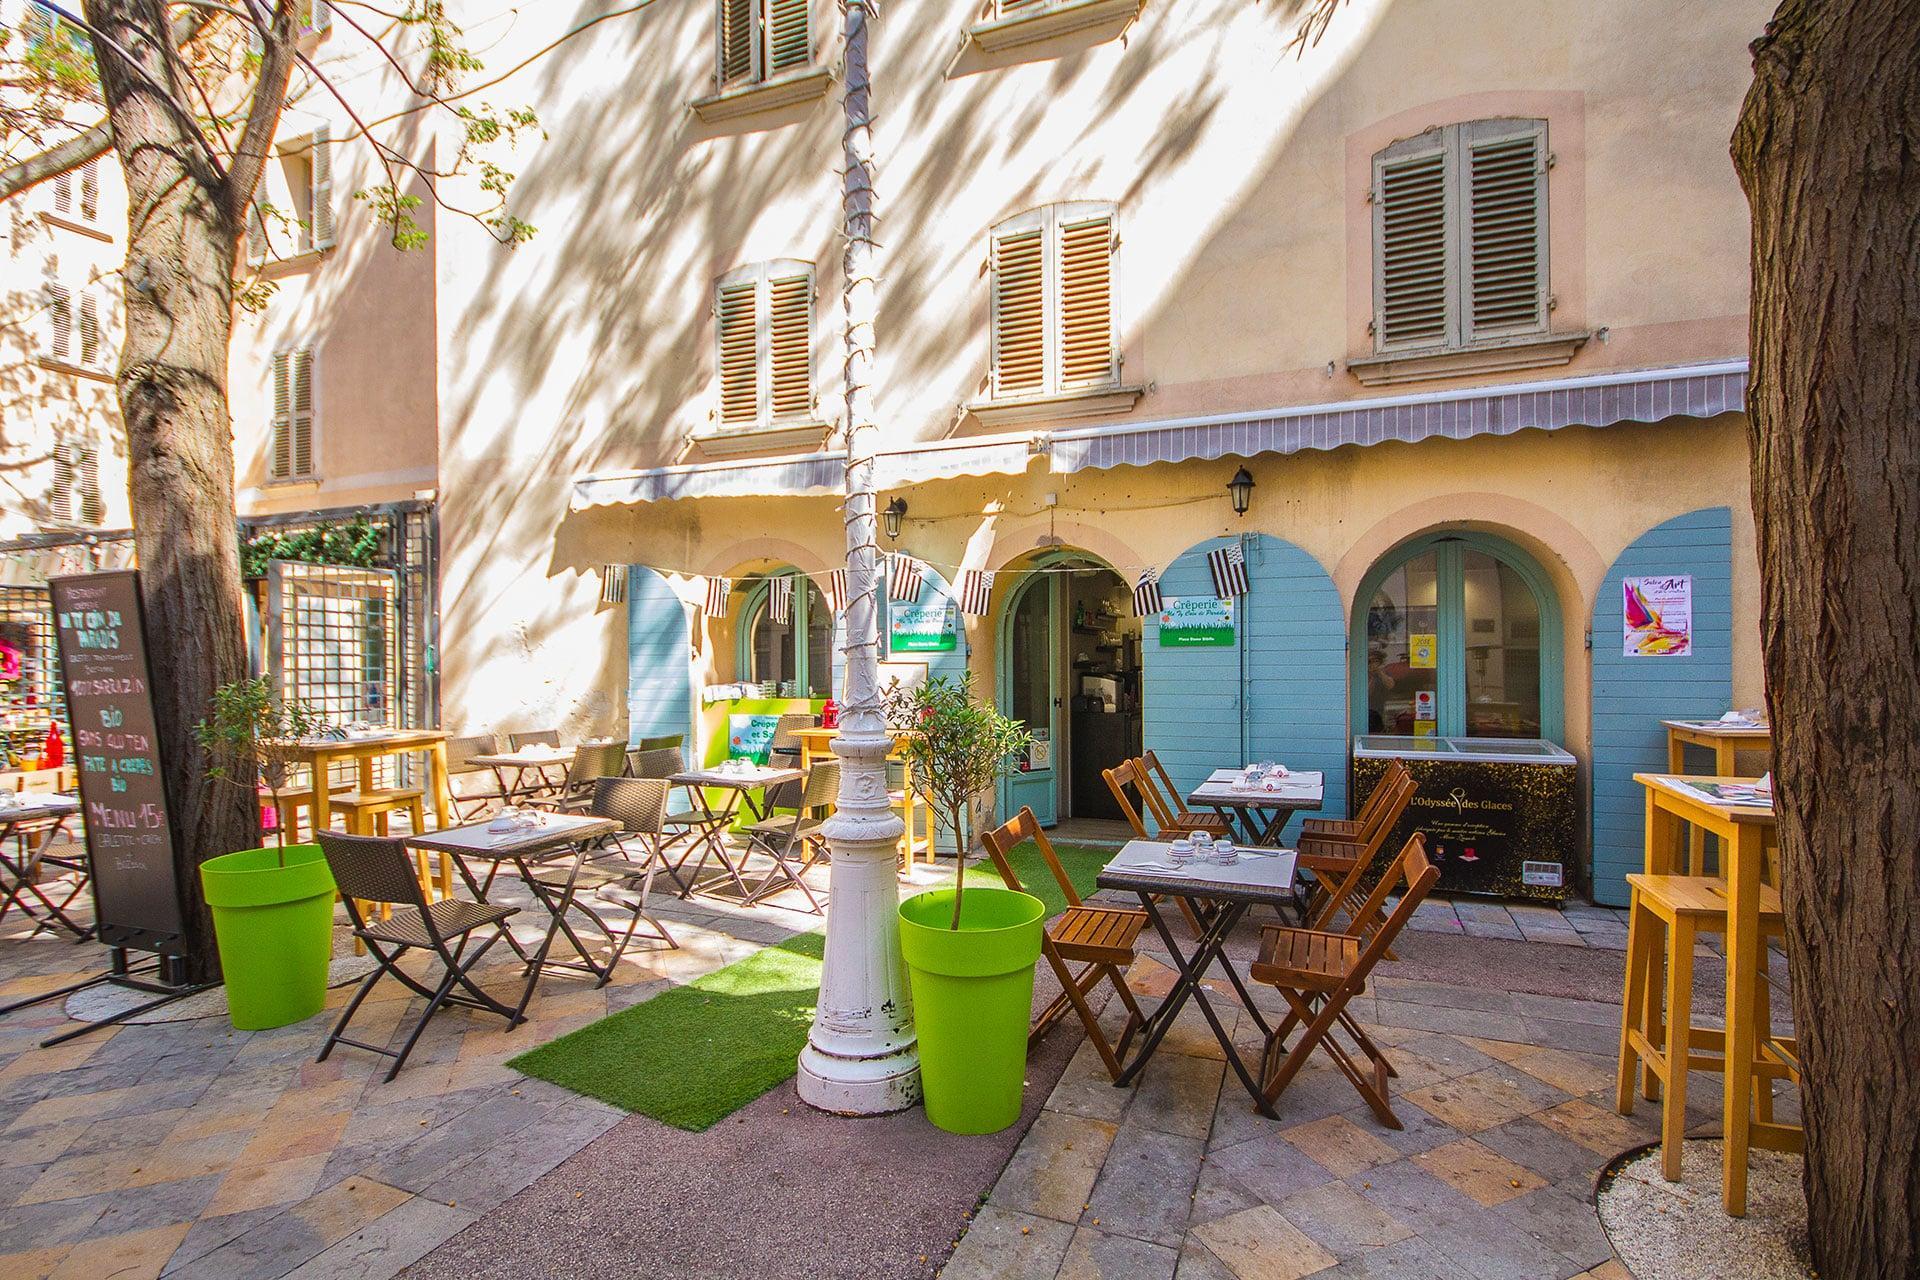 Ty Coin de Paradis crêperie bio Toulon